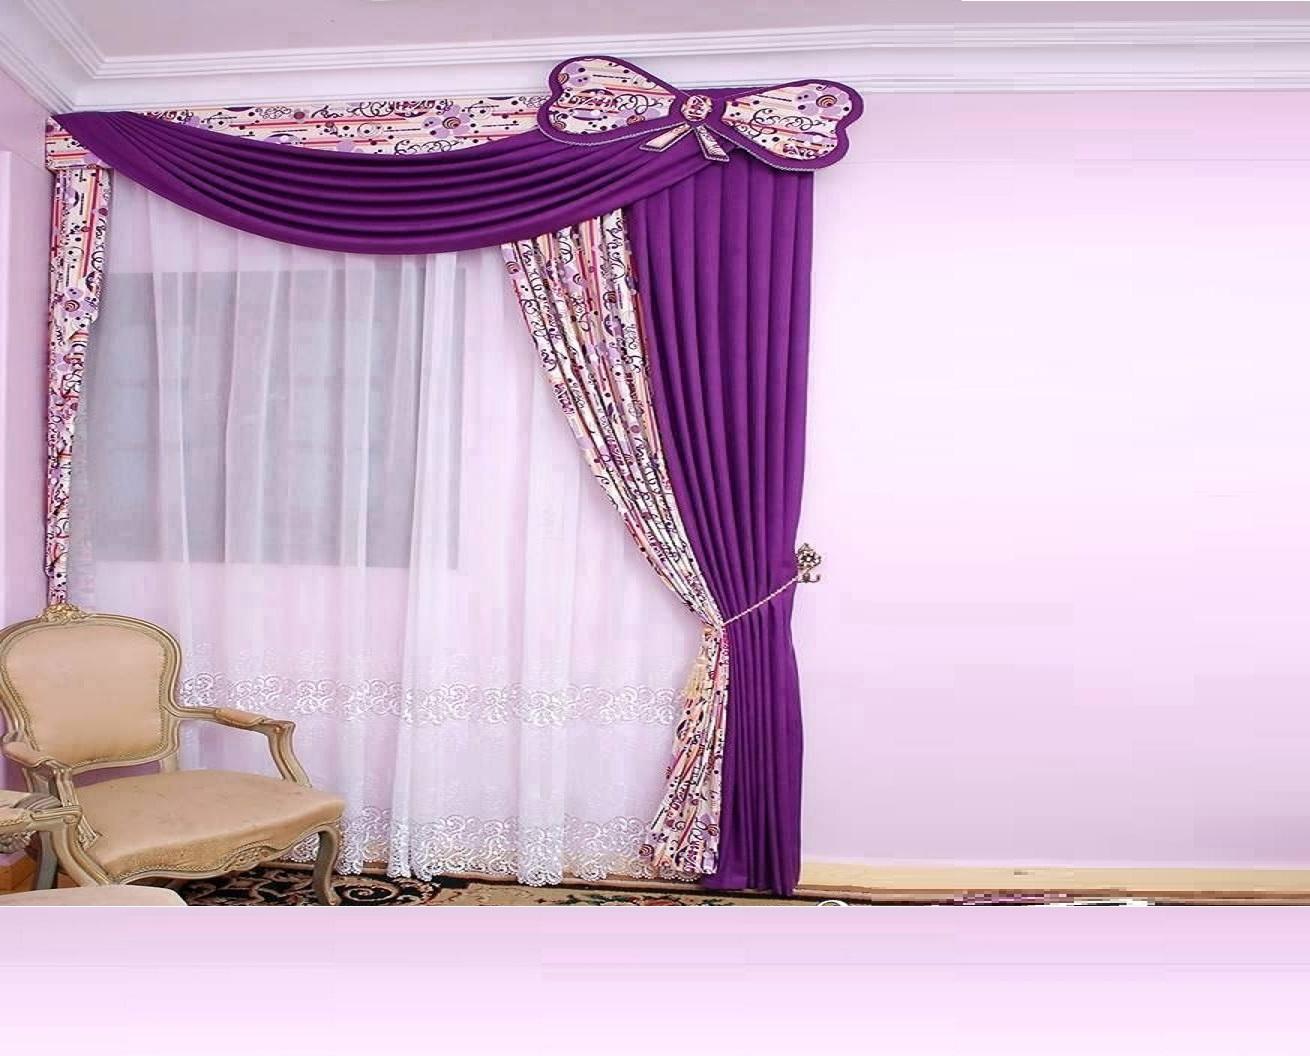 latest curtain designs patterns ideas